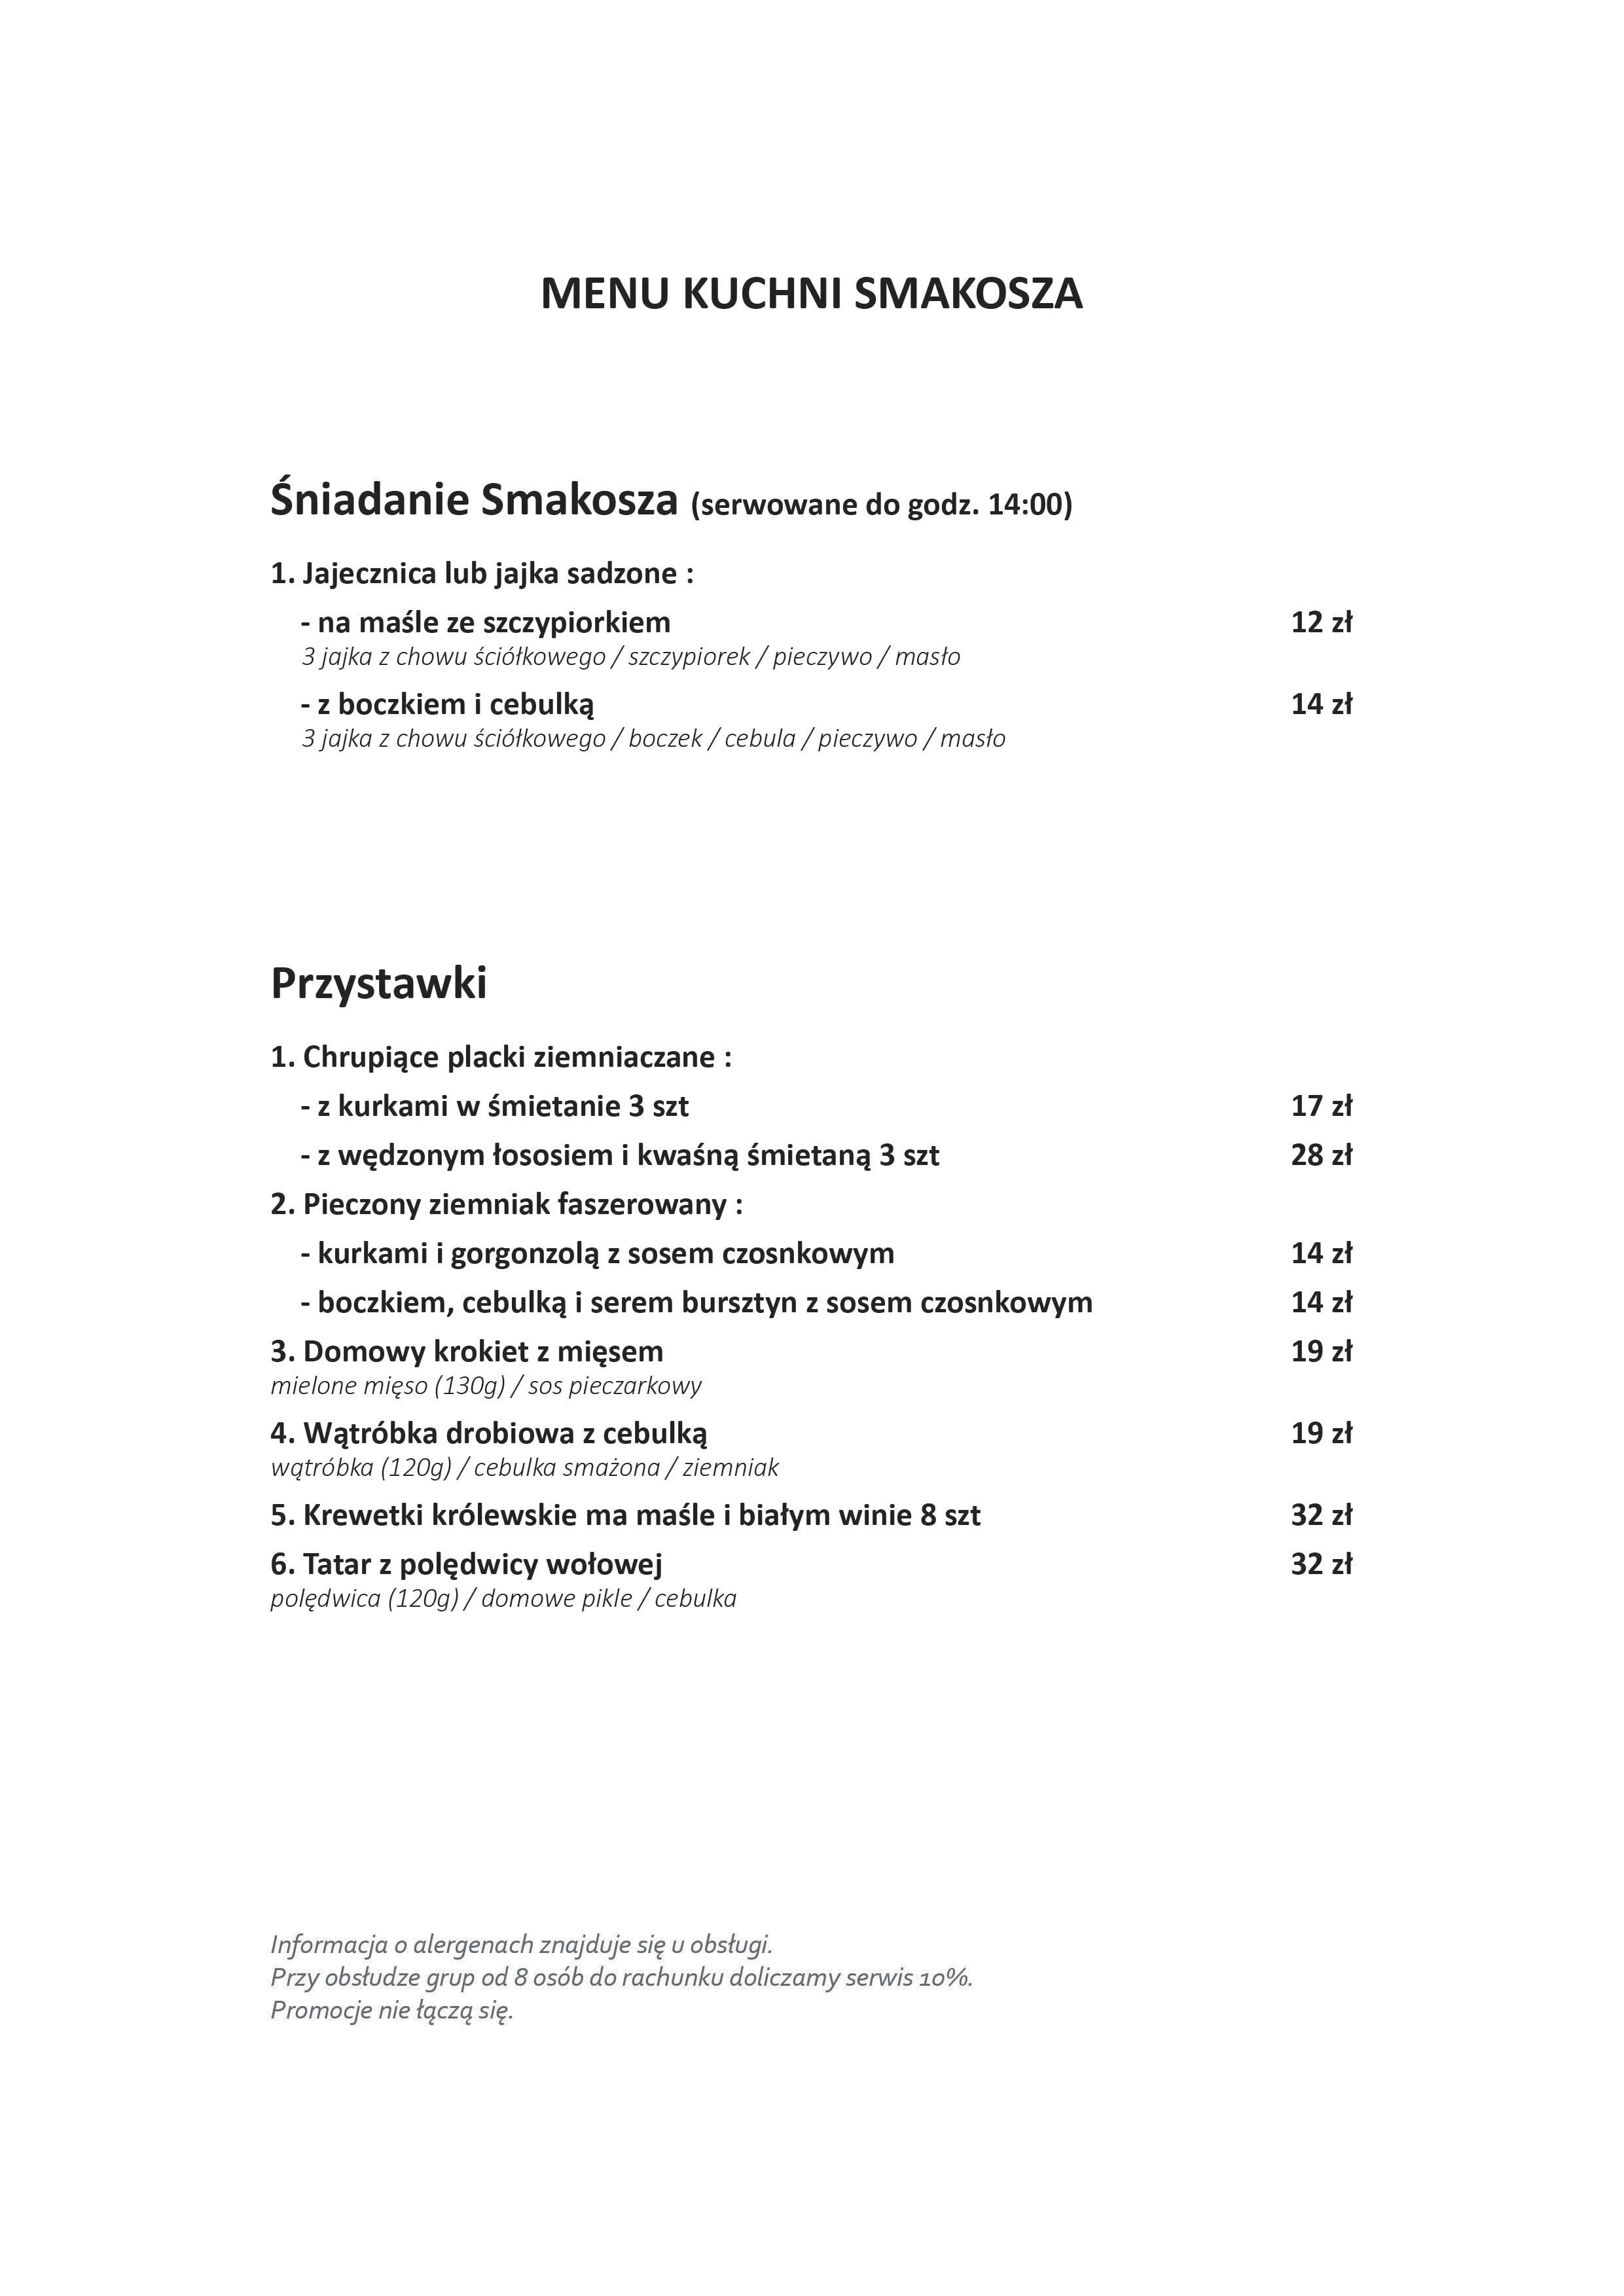 Kuchnia Smakosza Menu Menu Restauracji Kuchnia Smakosza Brodno Warszawa